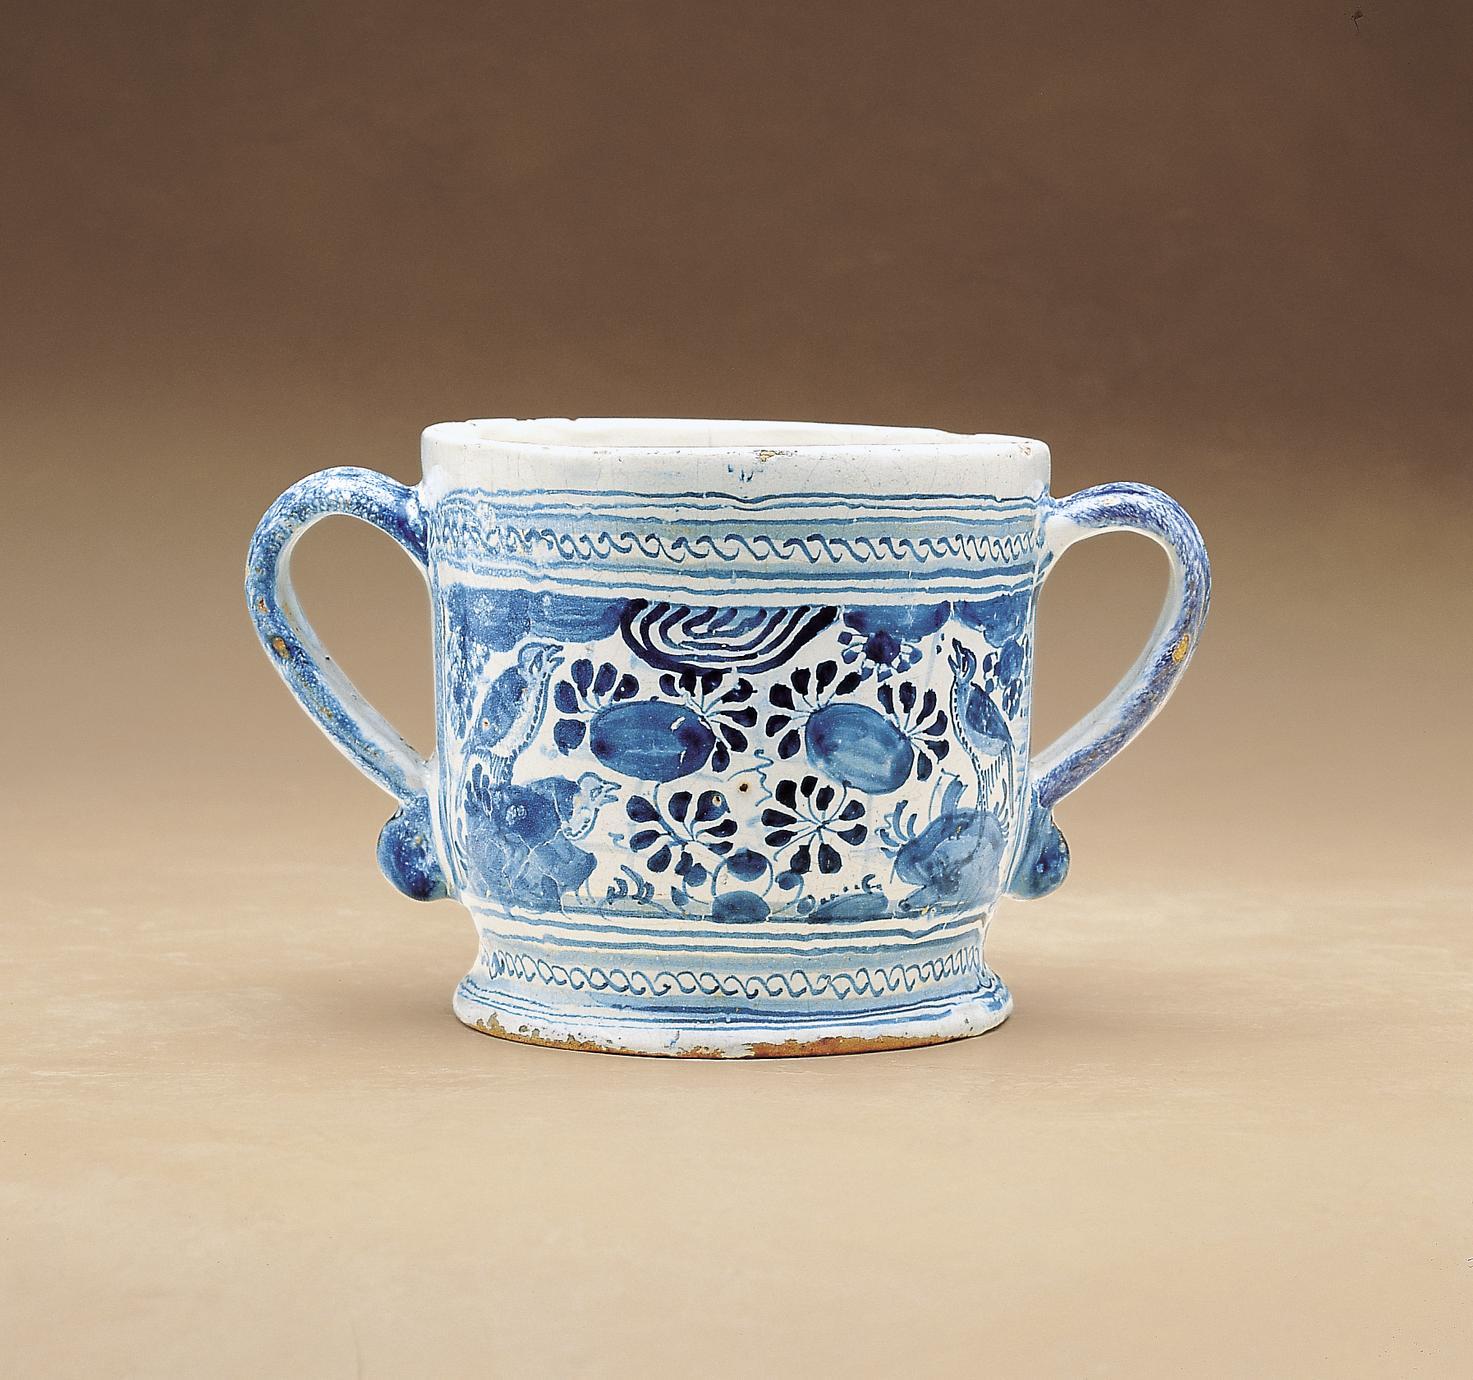 Posset pot (2 of 2)